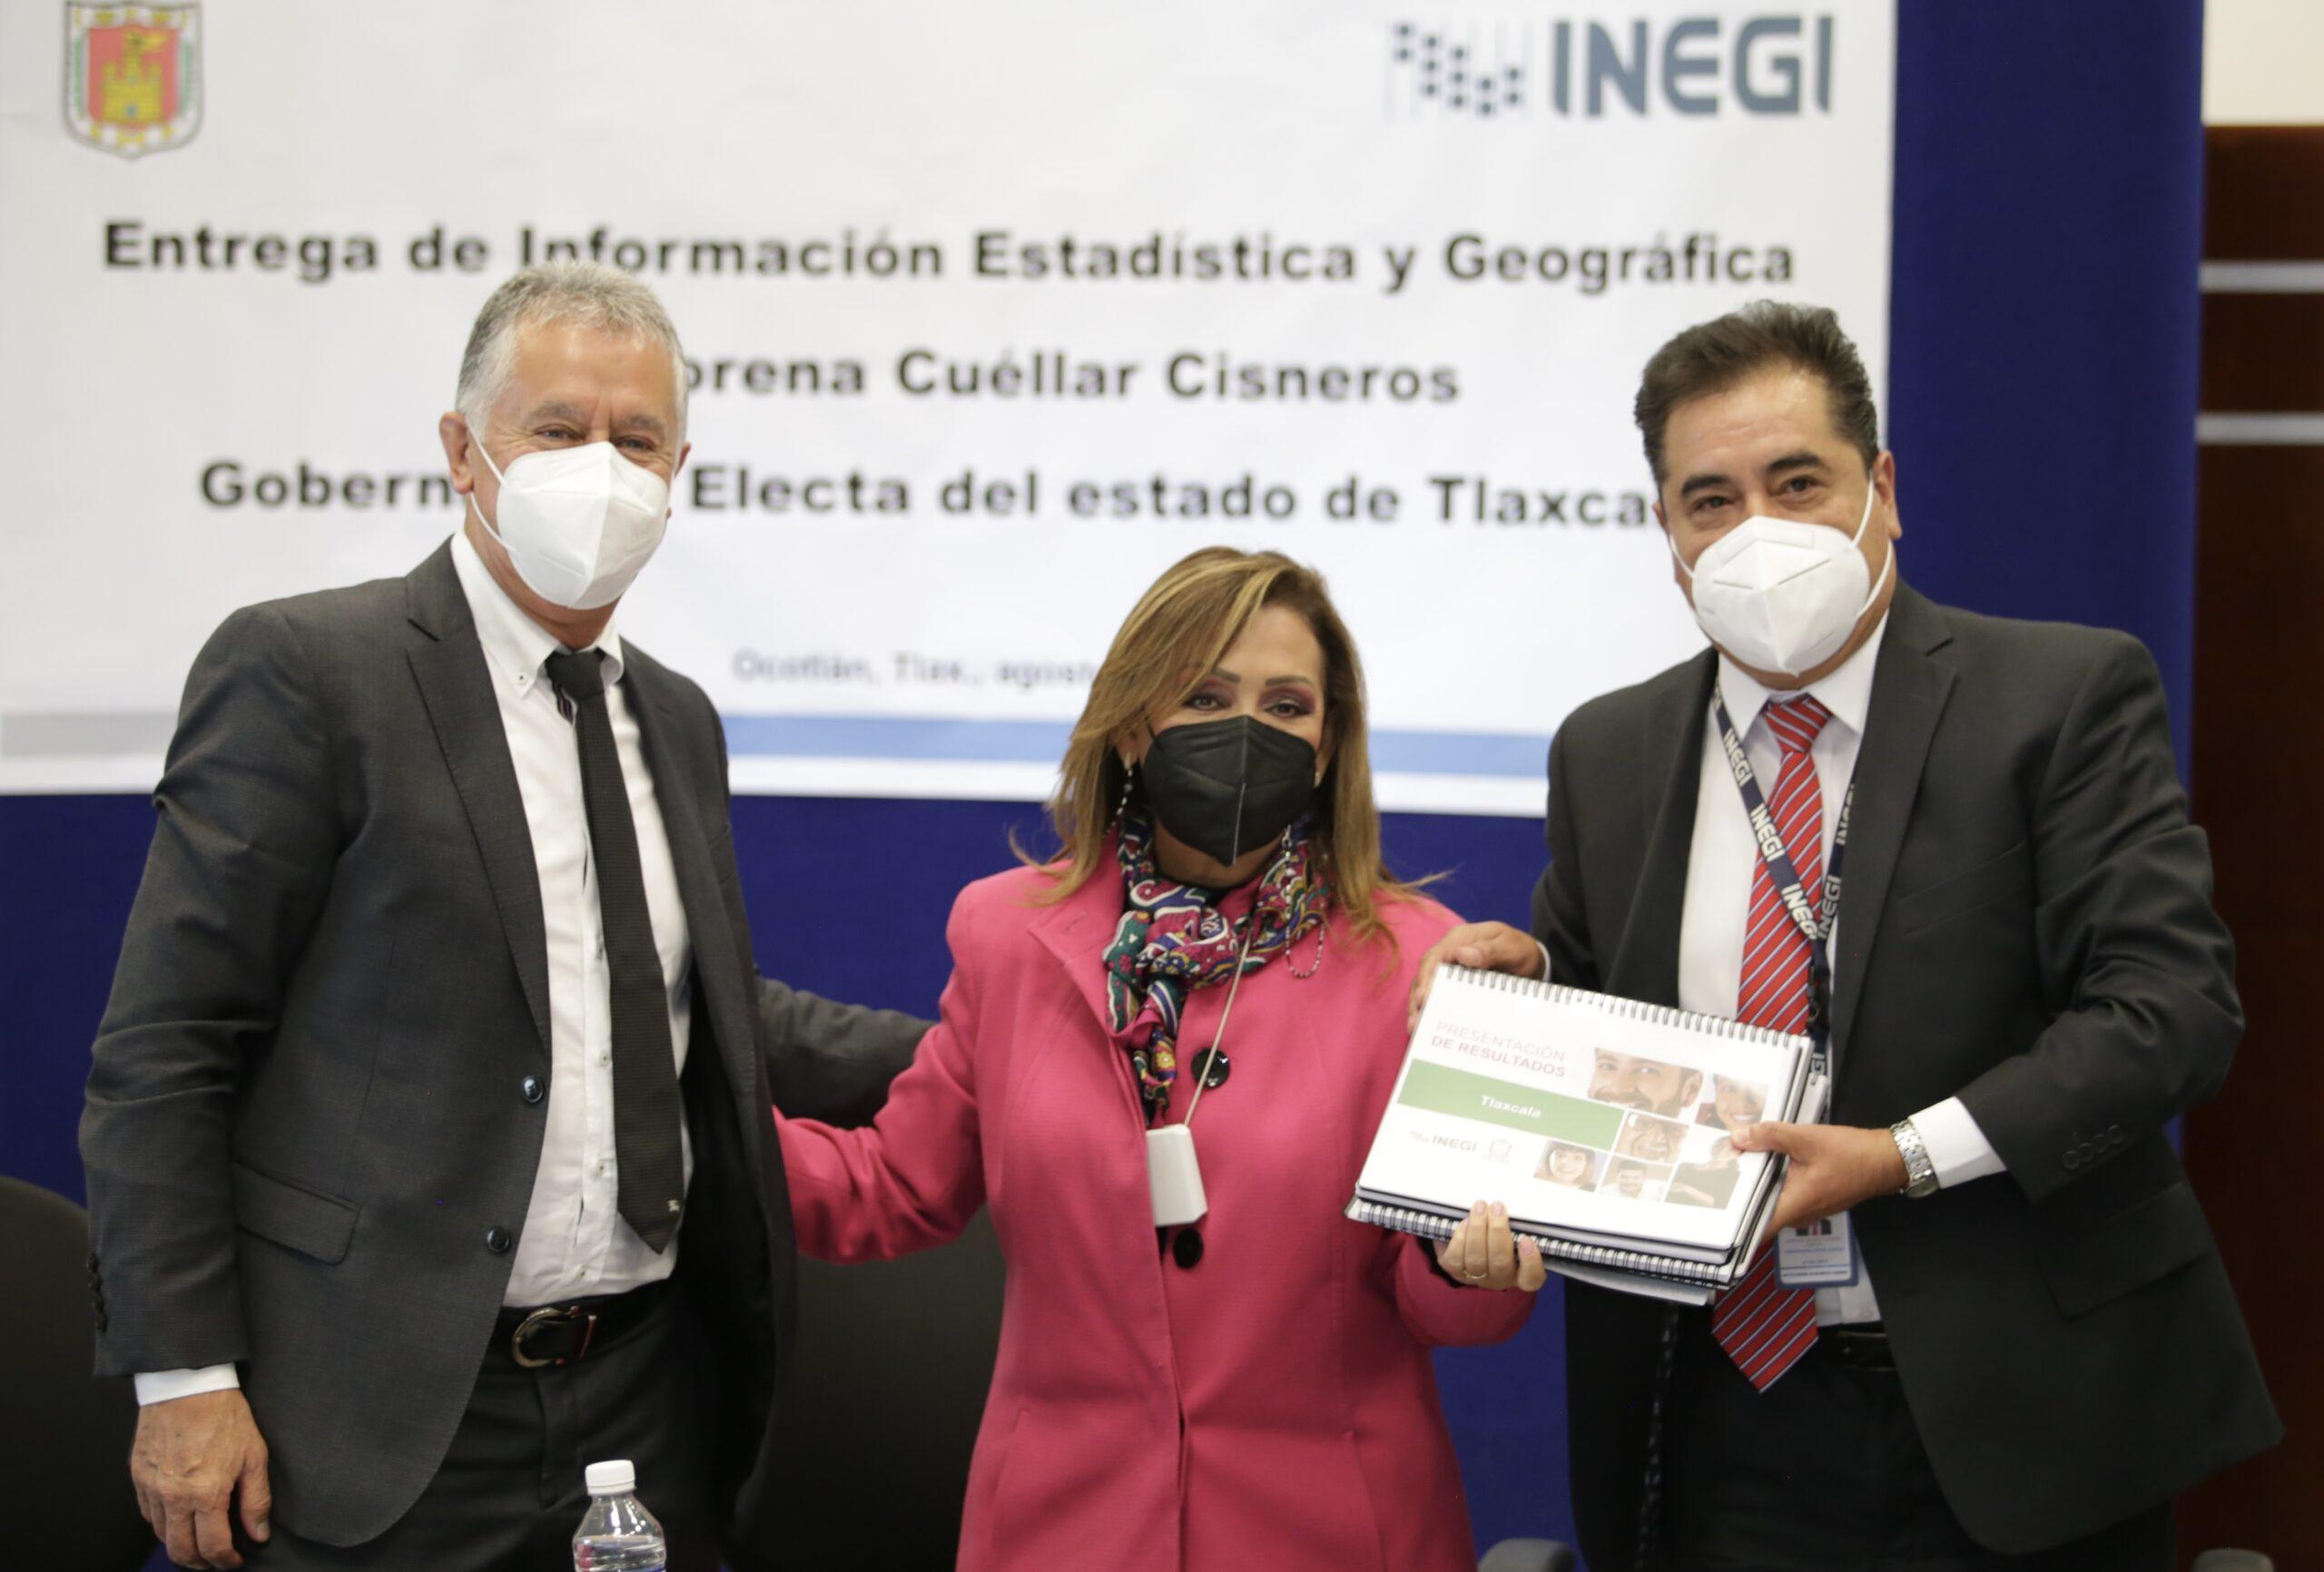 gobernadora electa e Inegi